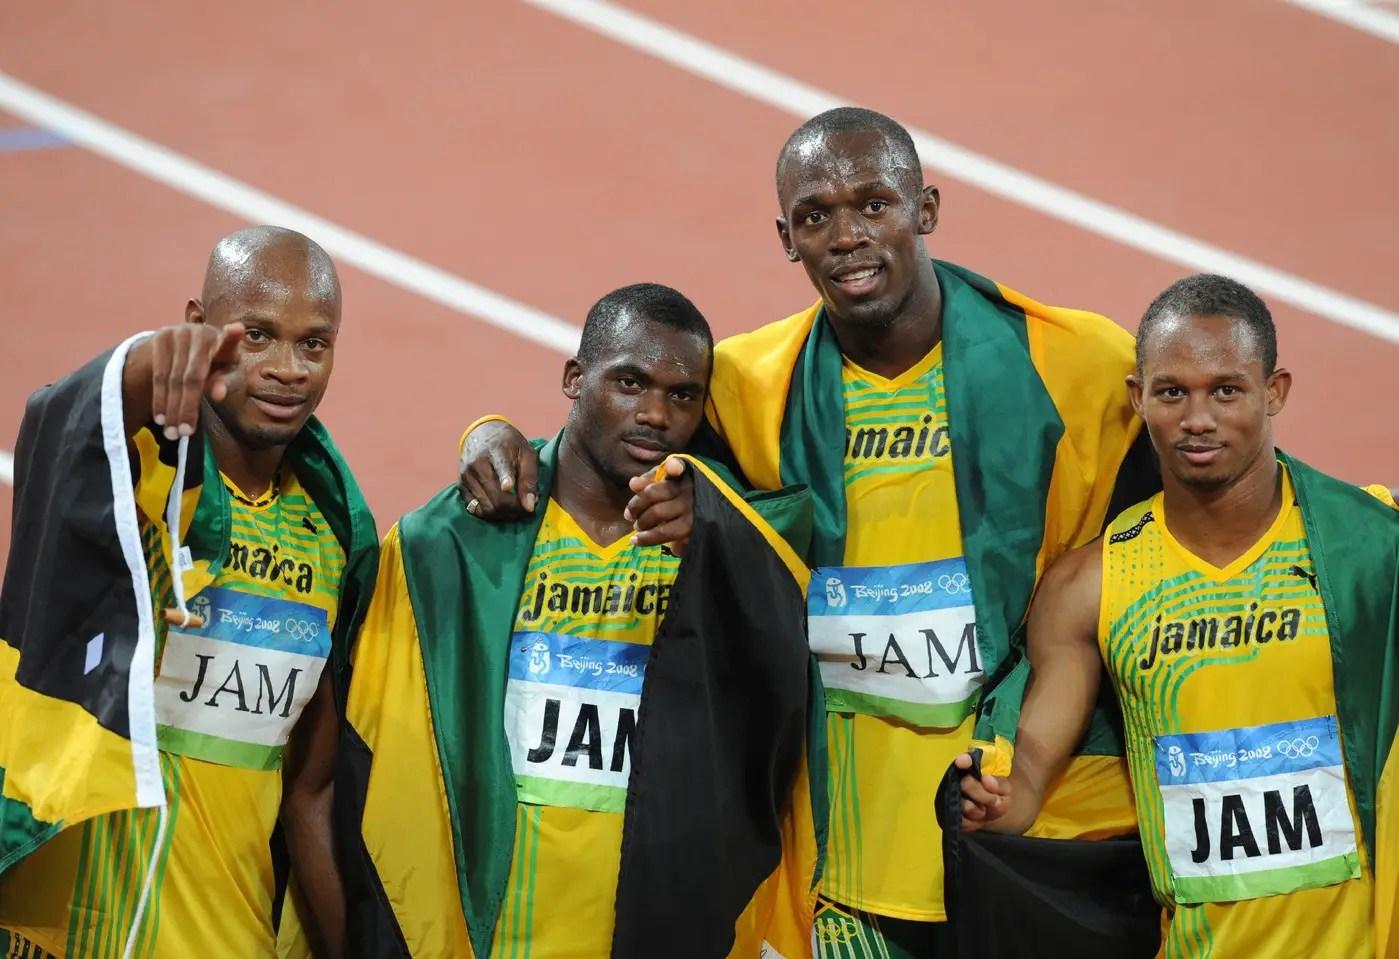 Bolt, Jamaica Teammates Lose Beijing 2008 Medals For Banned Drugs